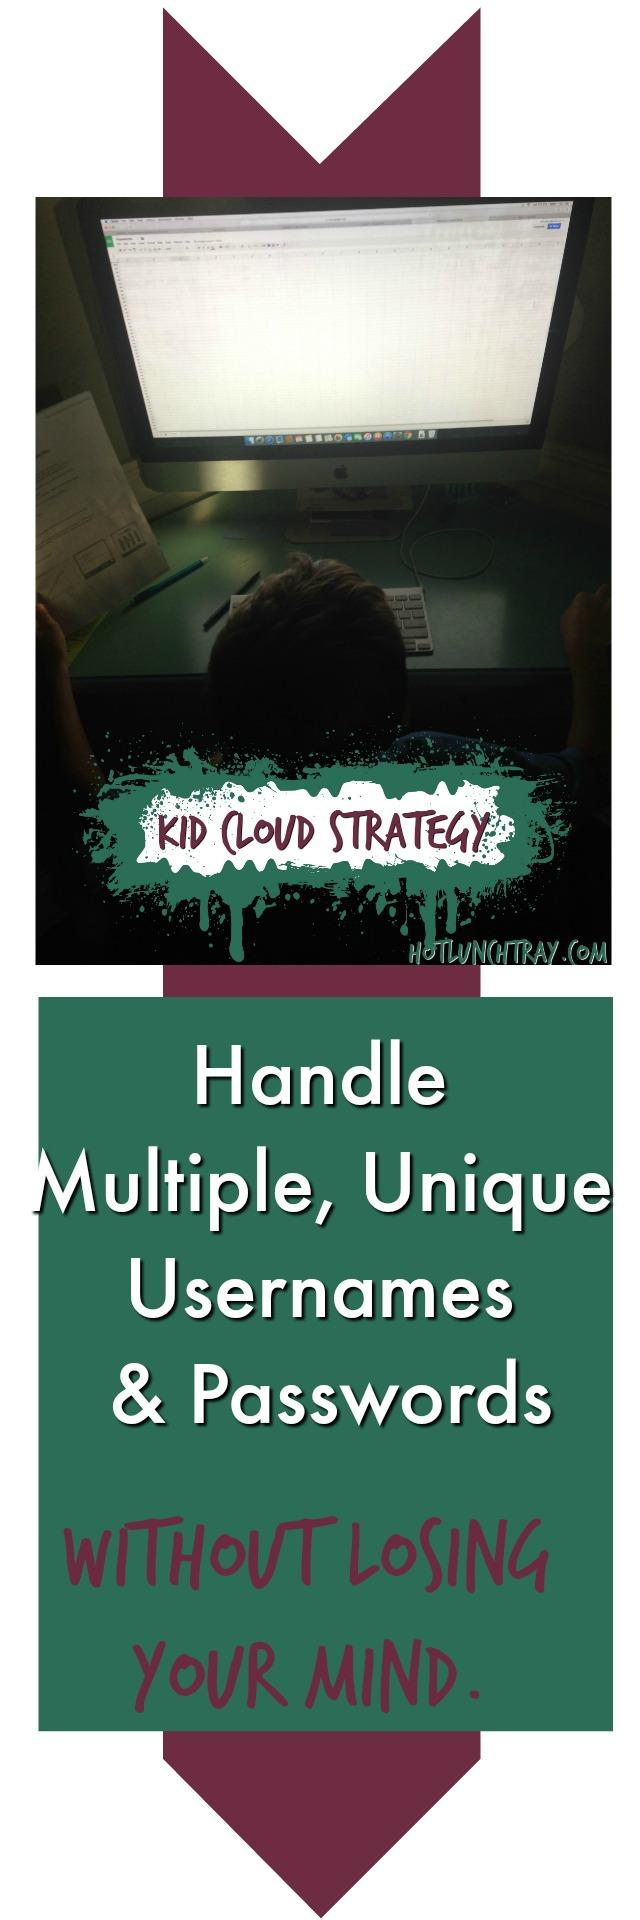 Kid Cloud Strategy PINTEREST